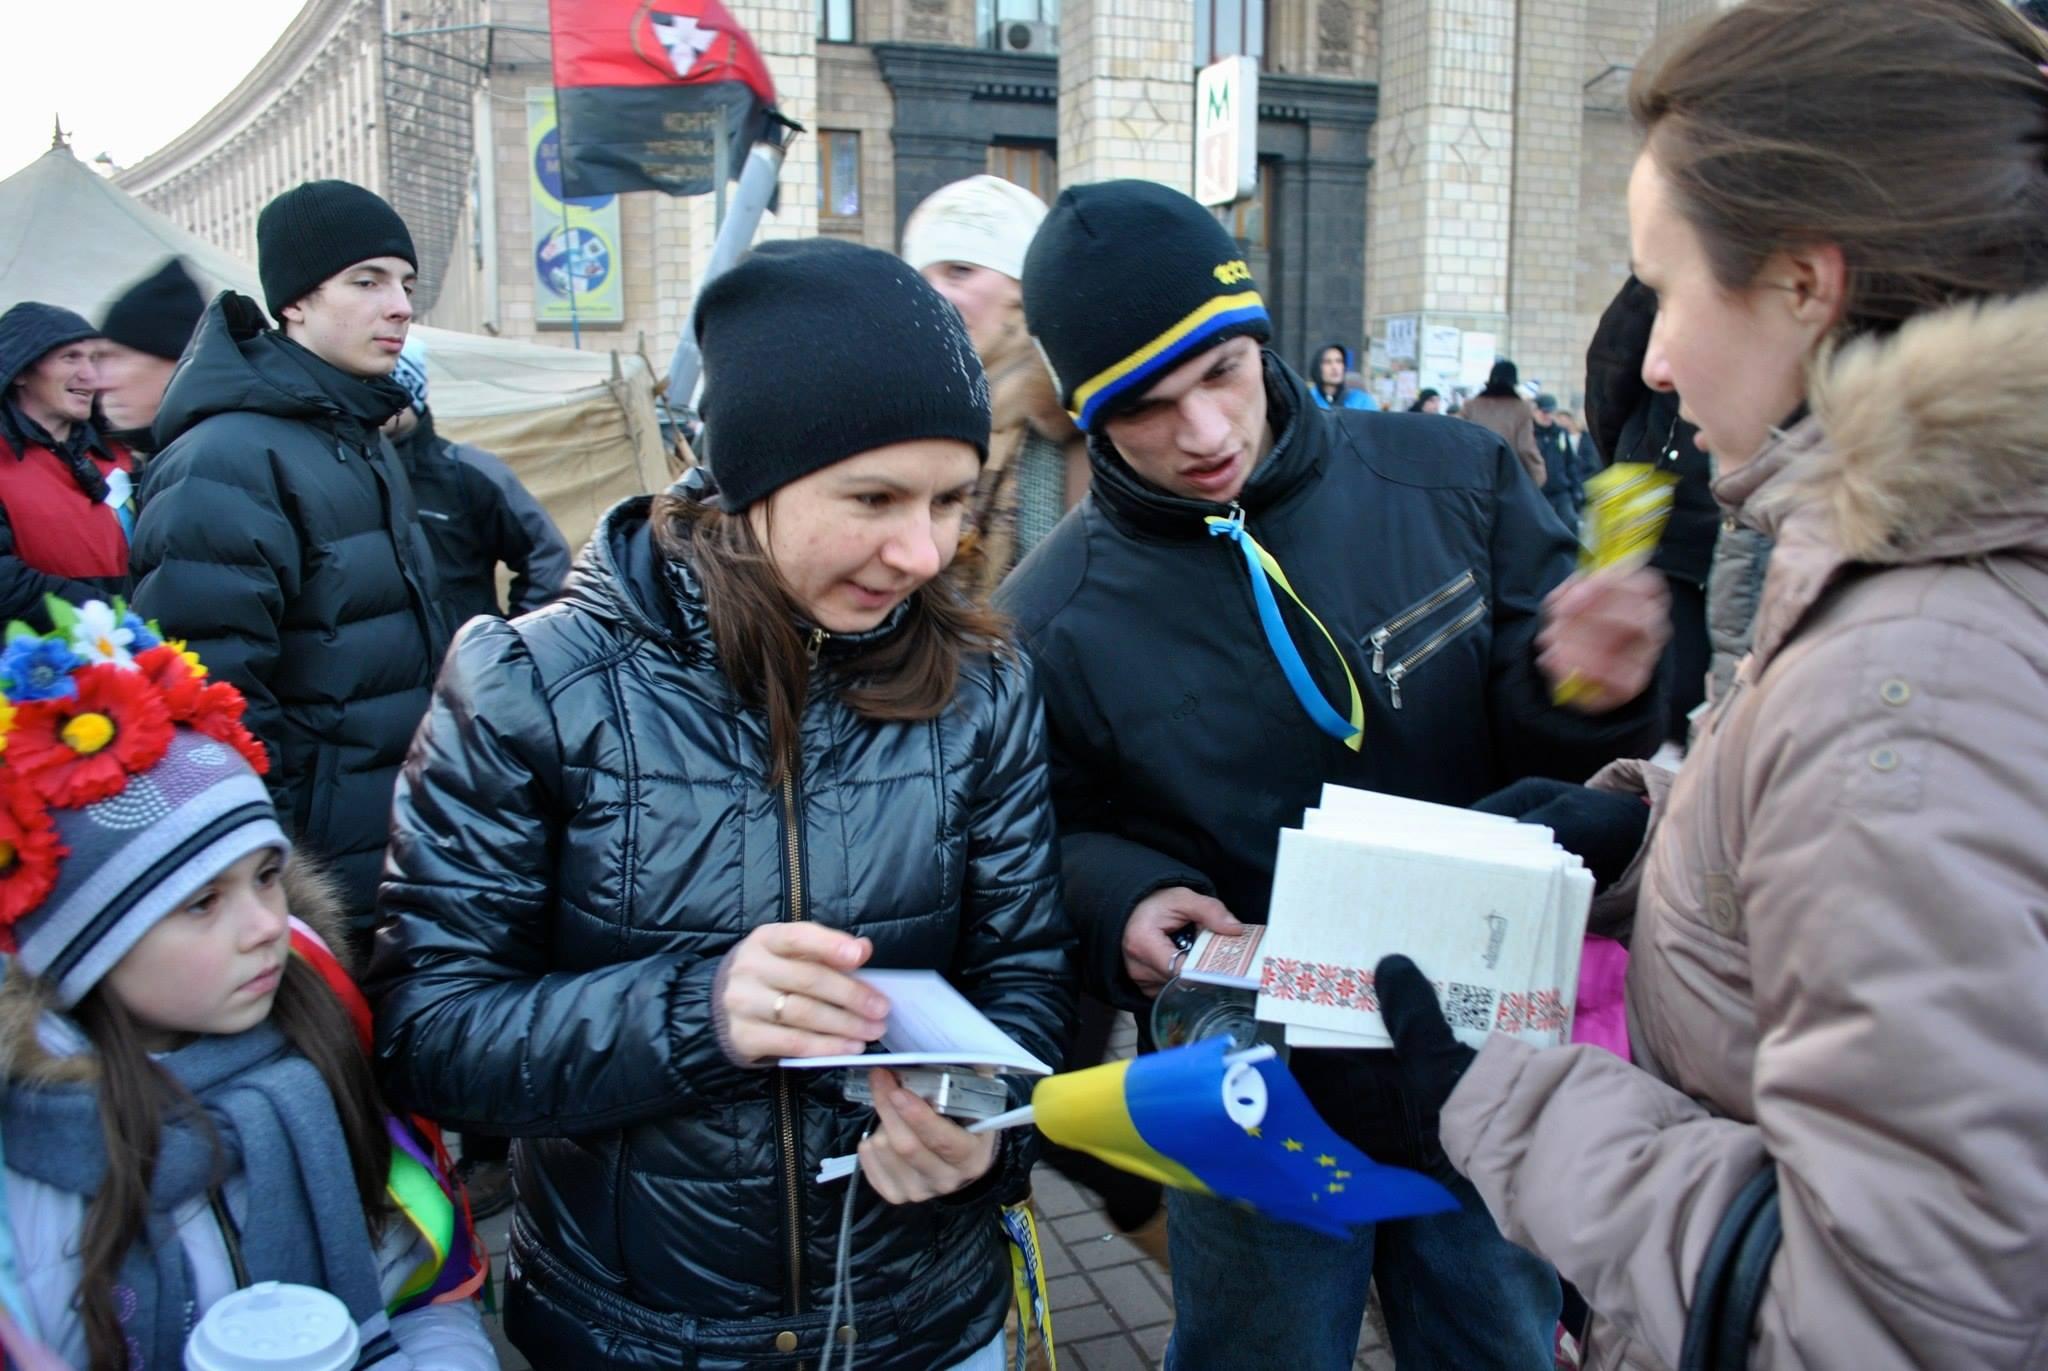 Gospels of John shared with Ukrainian protestors